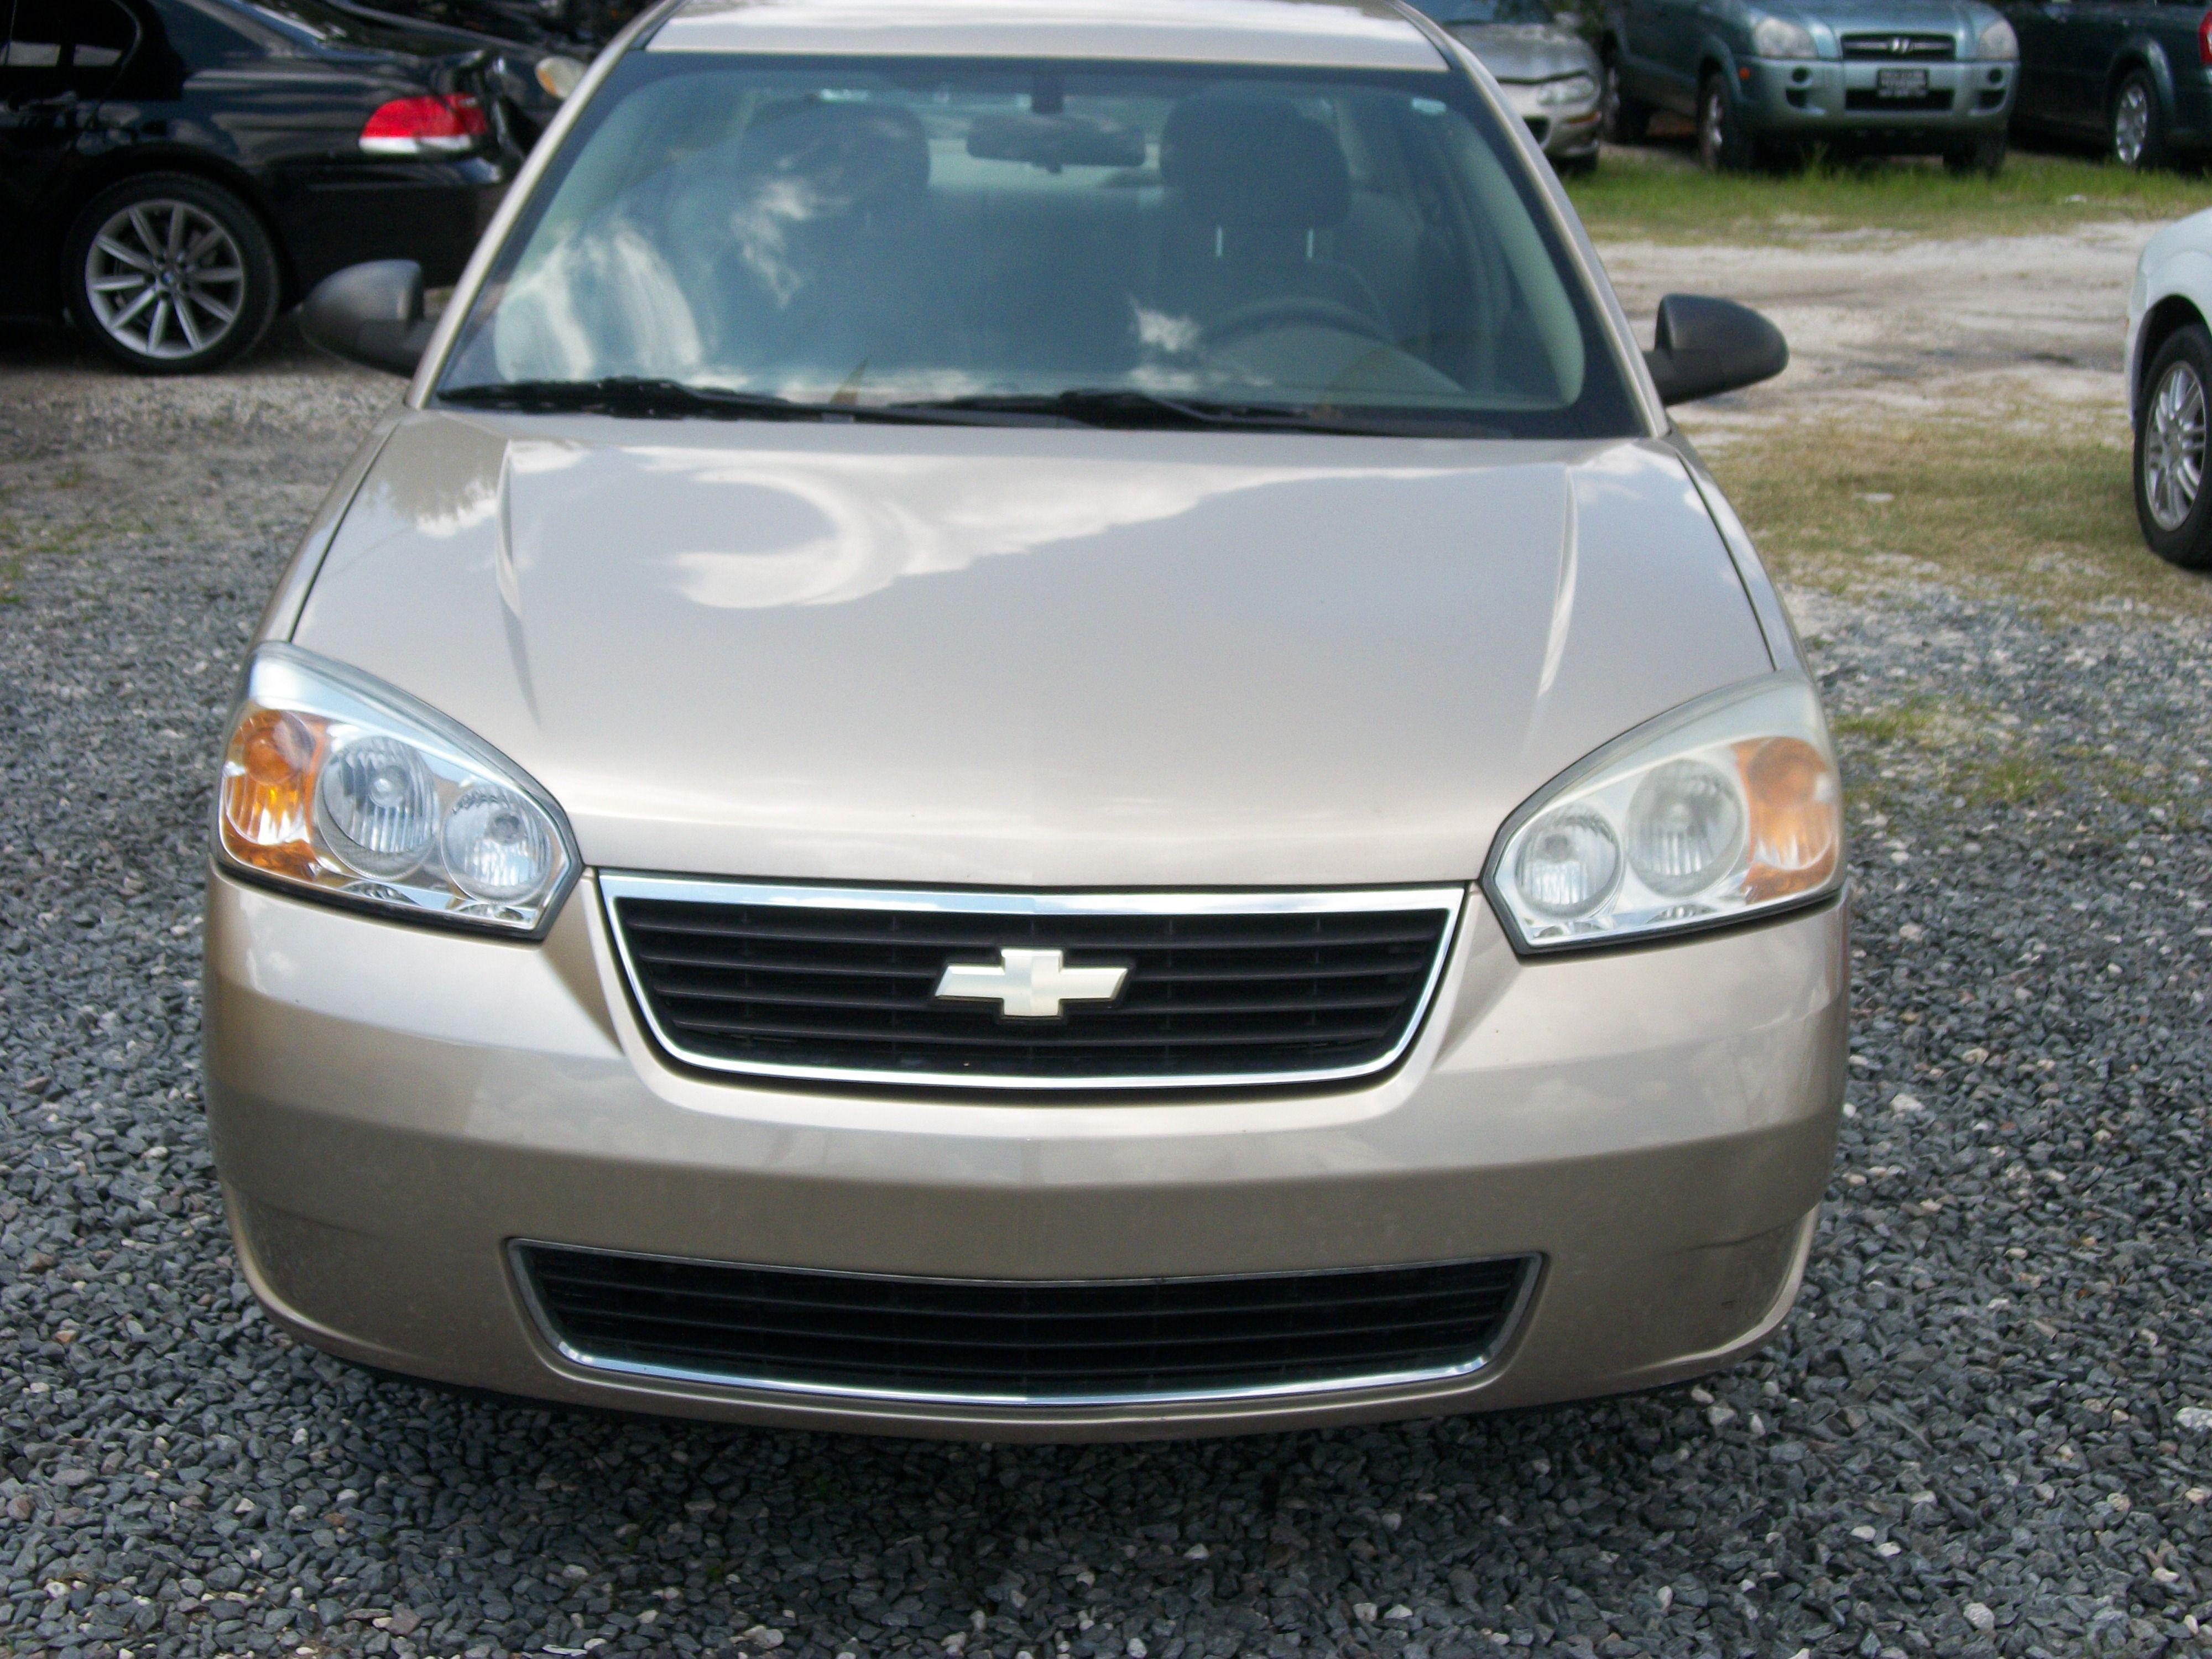 2008 Chevrolet Malibu Tan 125k 7 500 Tan Leather Seats 4 Door